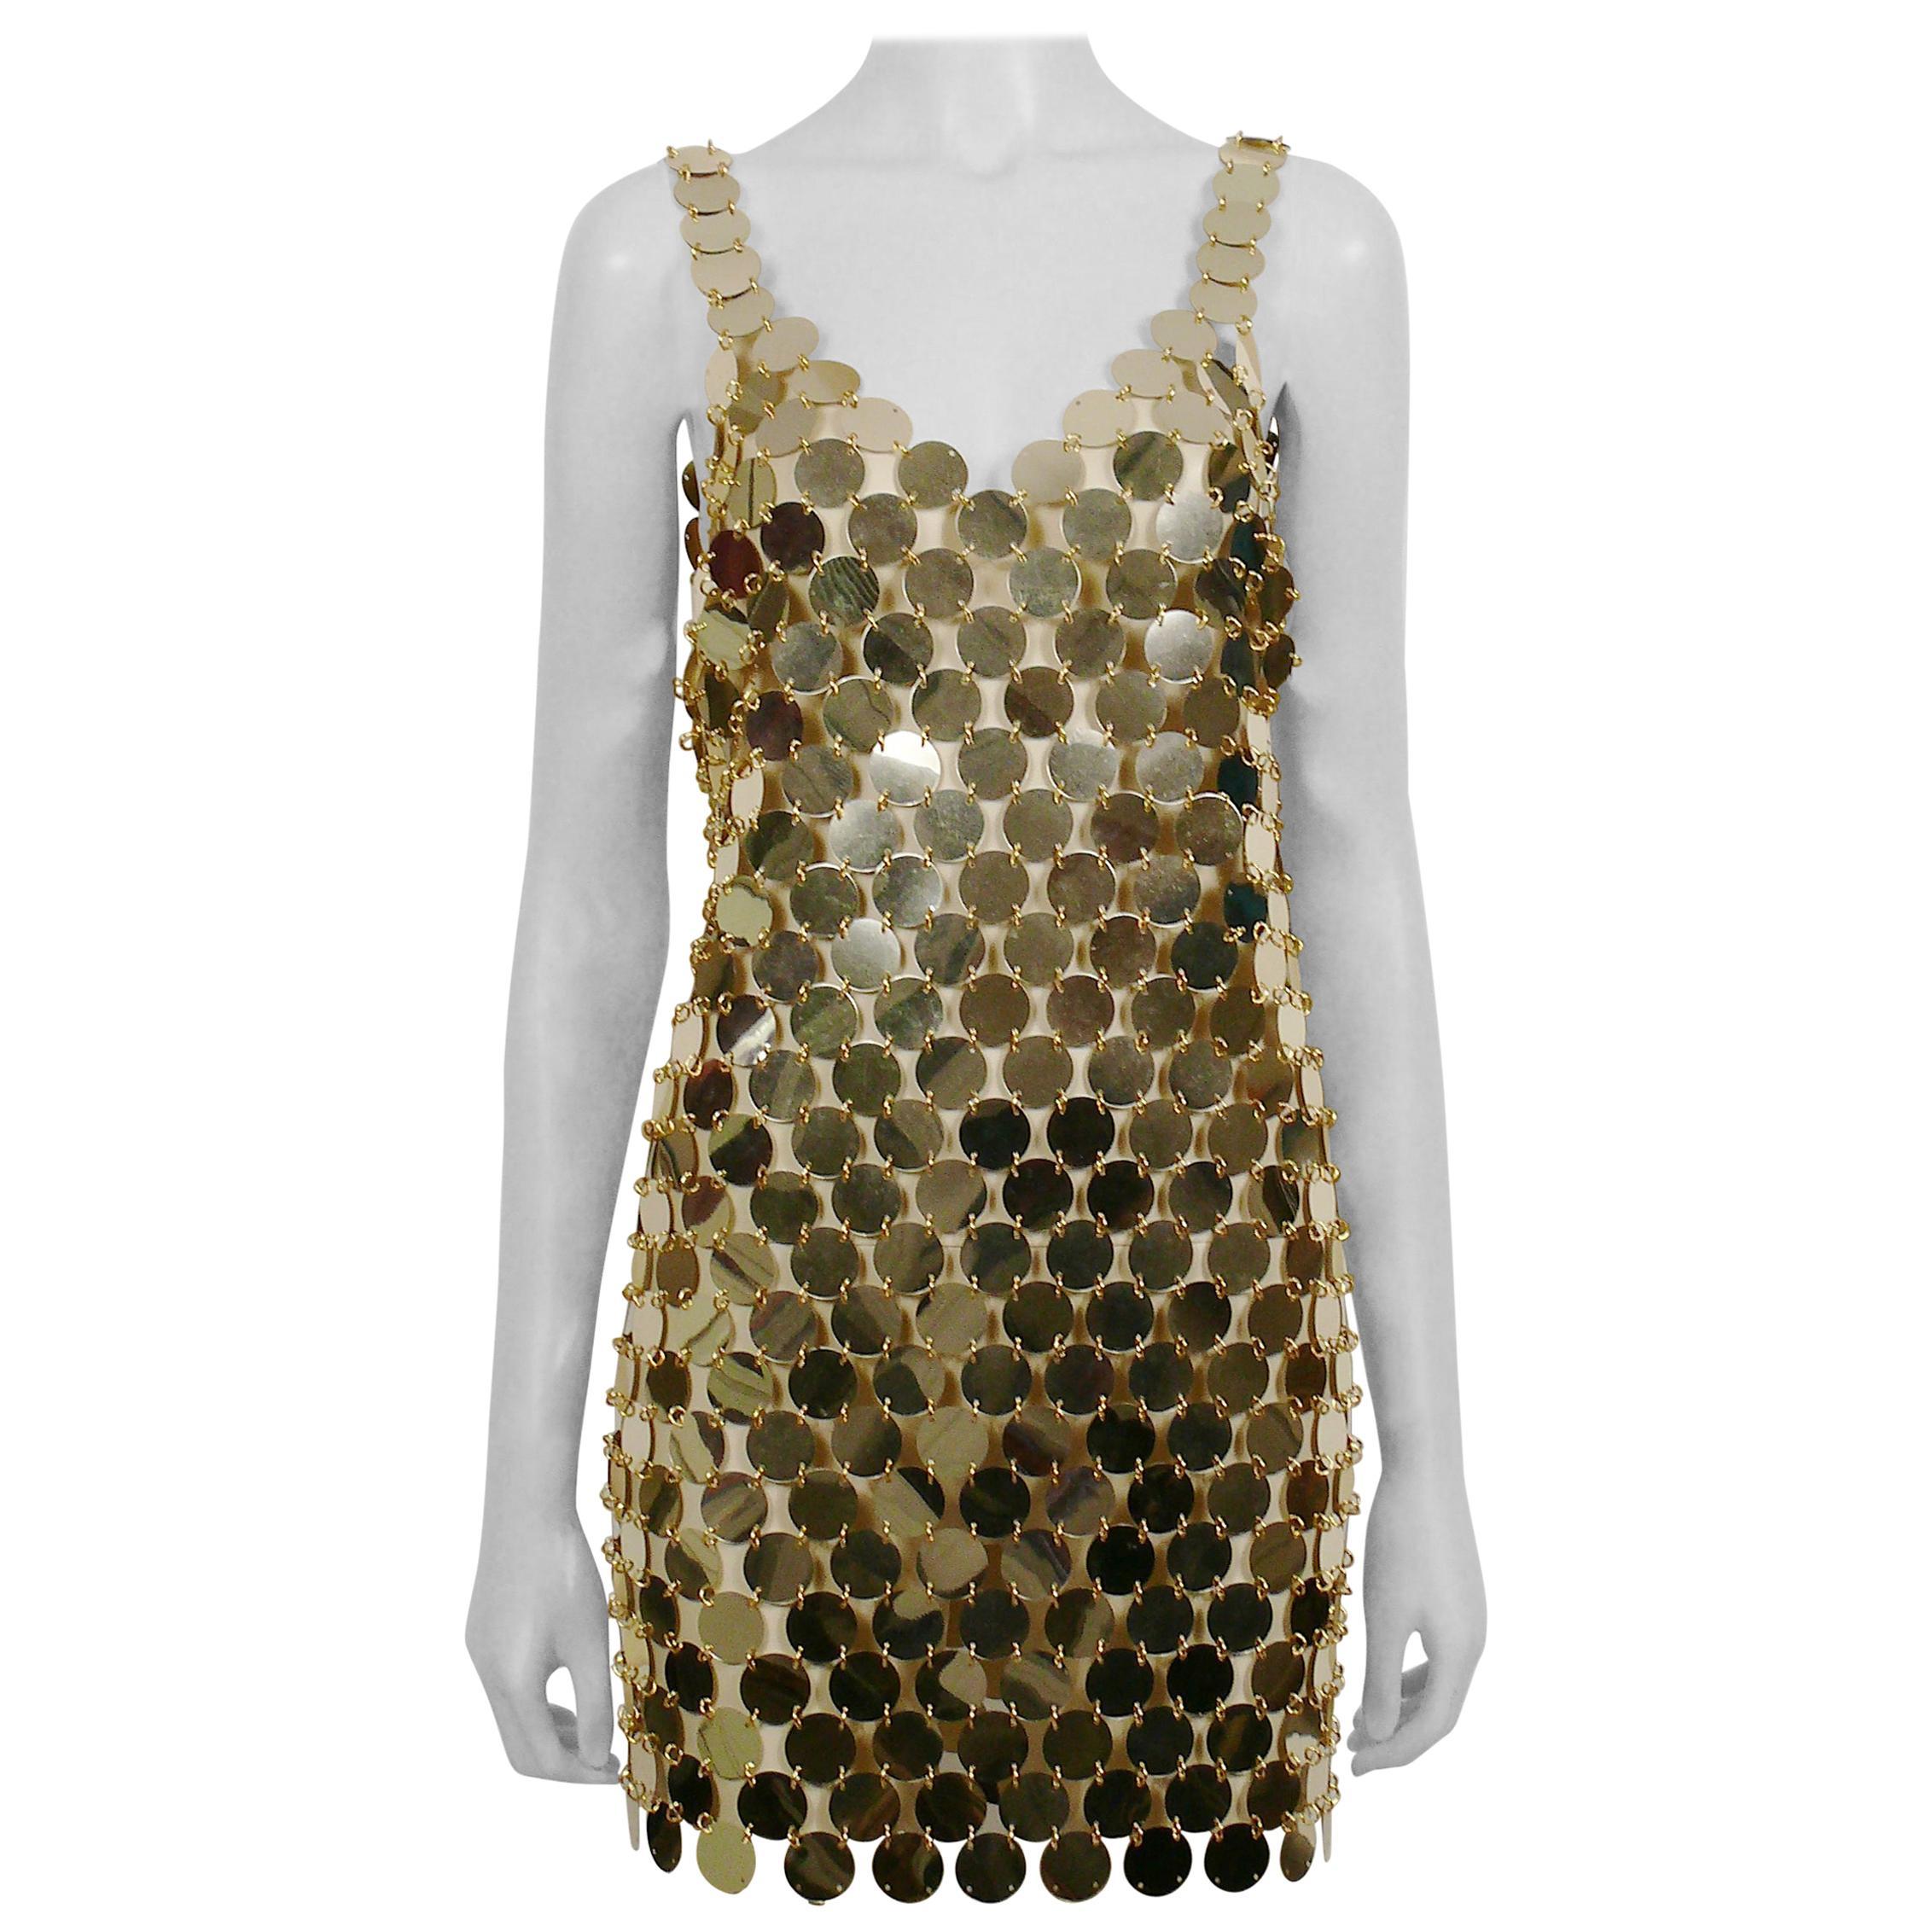 Paco Rabanne Vintage 1996 Gold Rhodoid Disc Do It Yourself Mini Dress